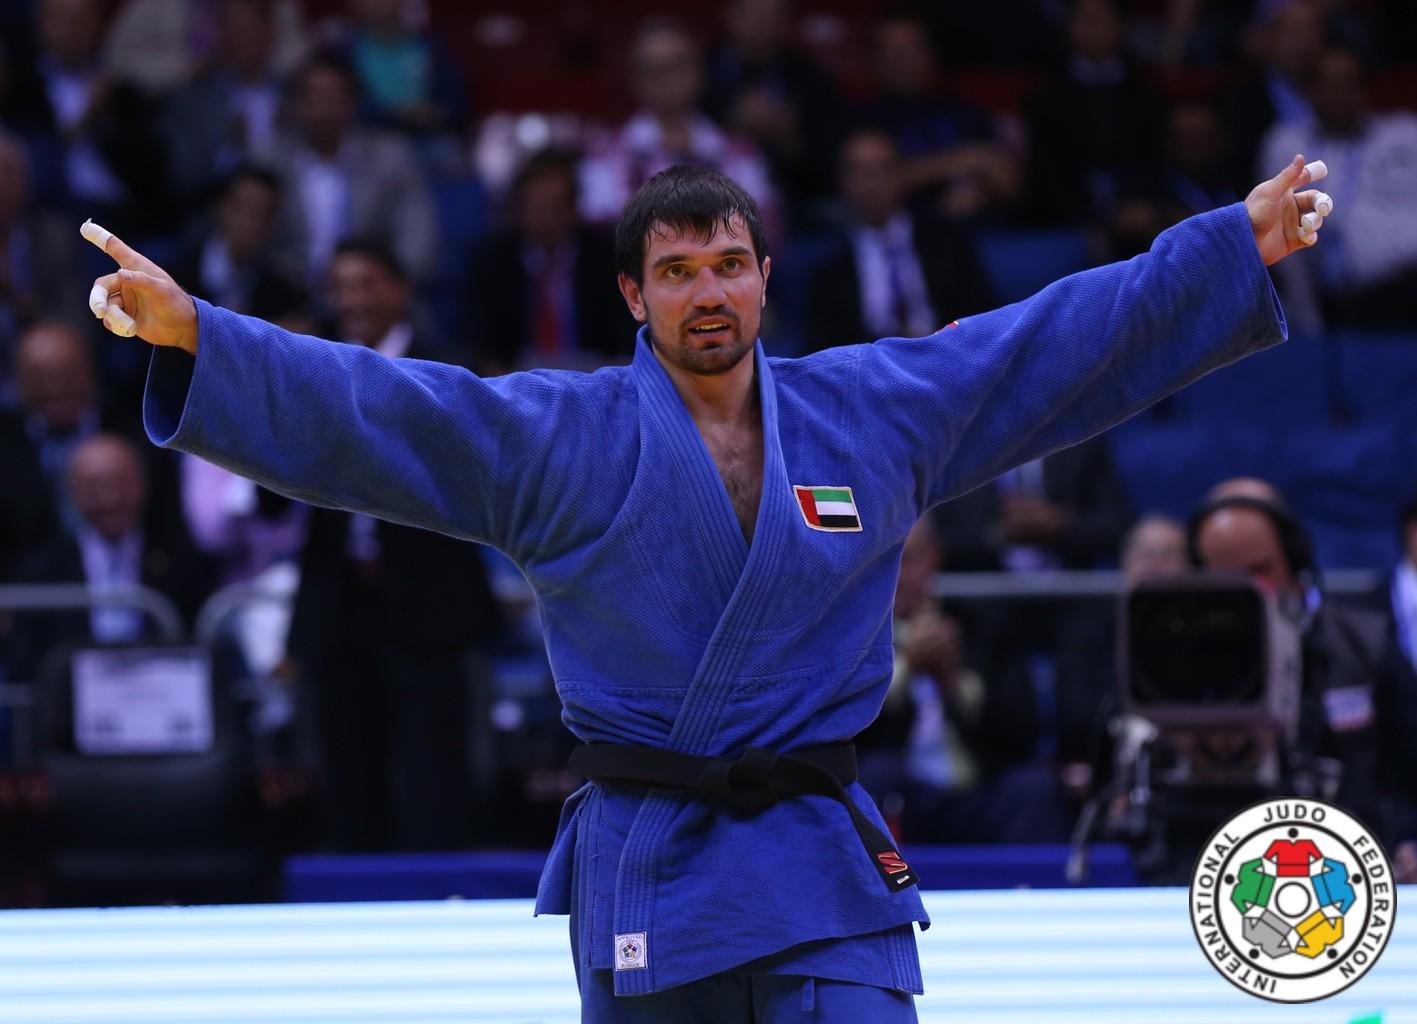 Victor Scvortov judoca dos Emirados